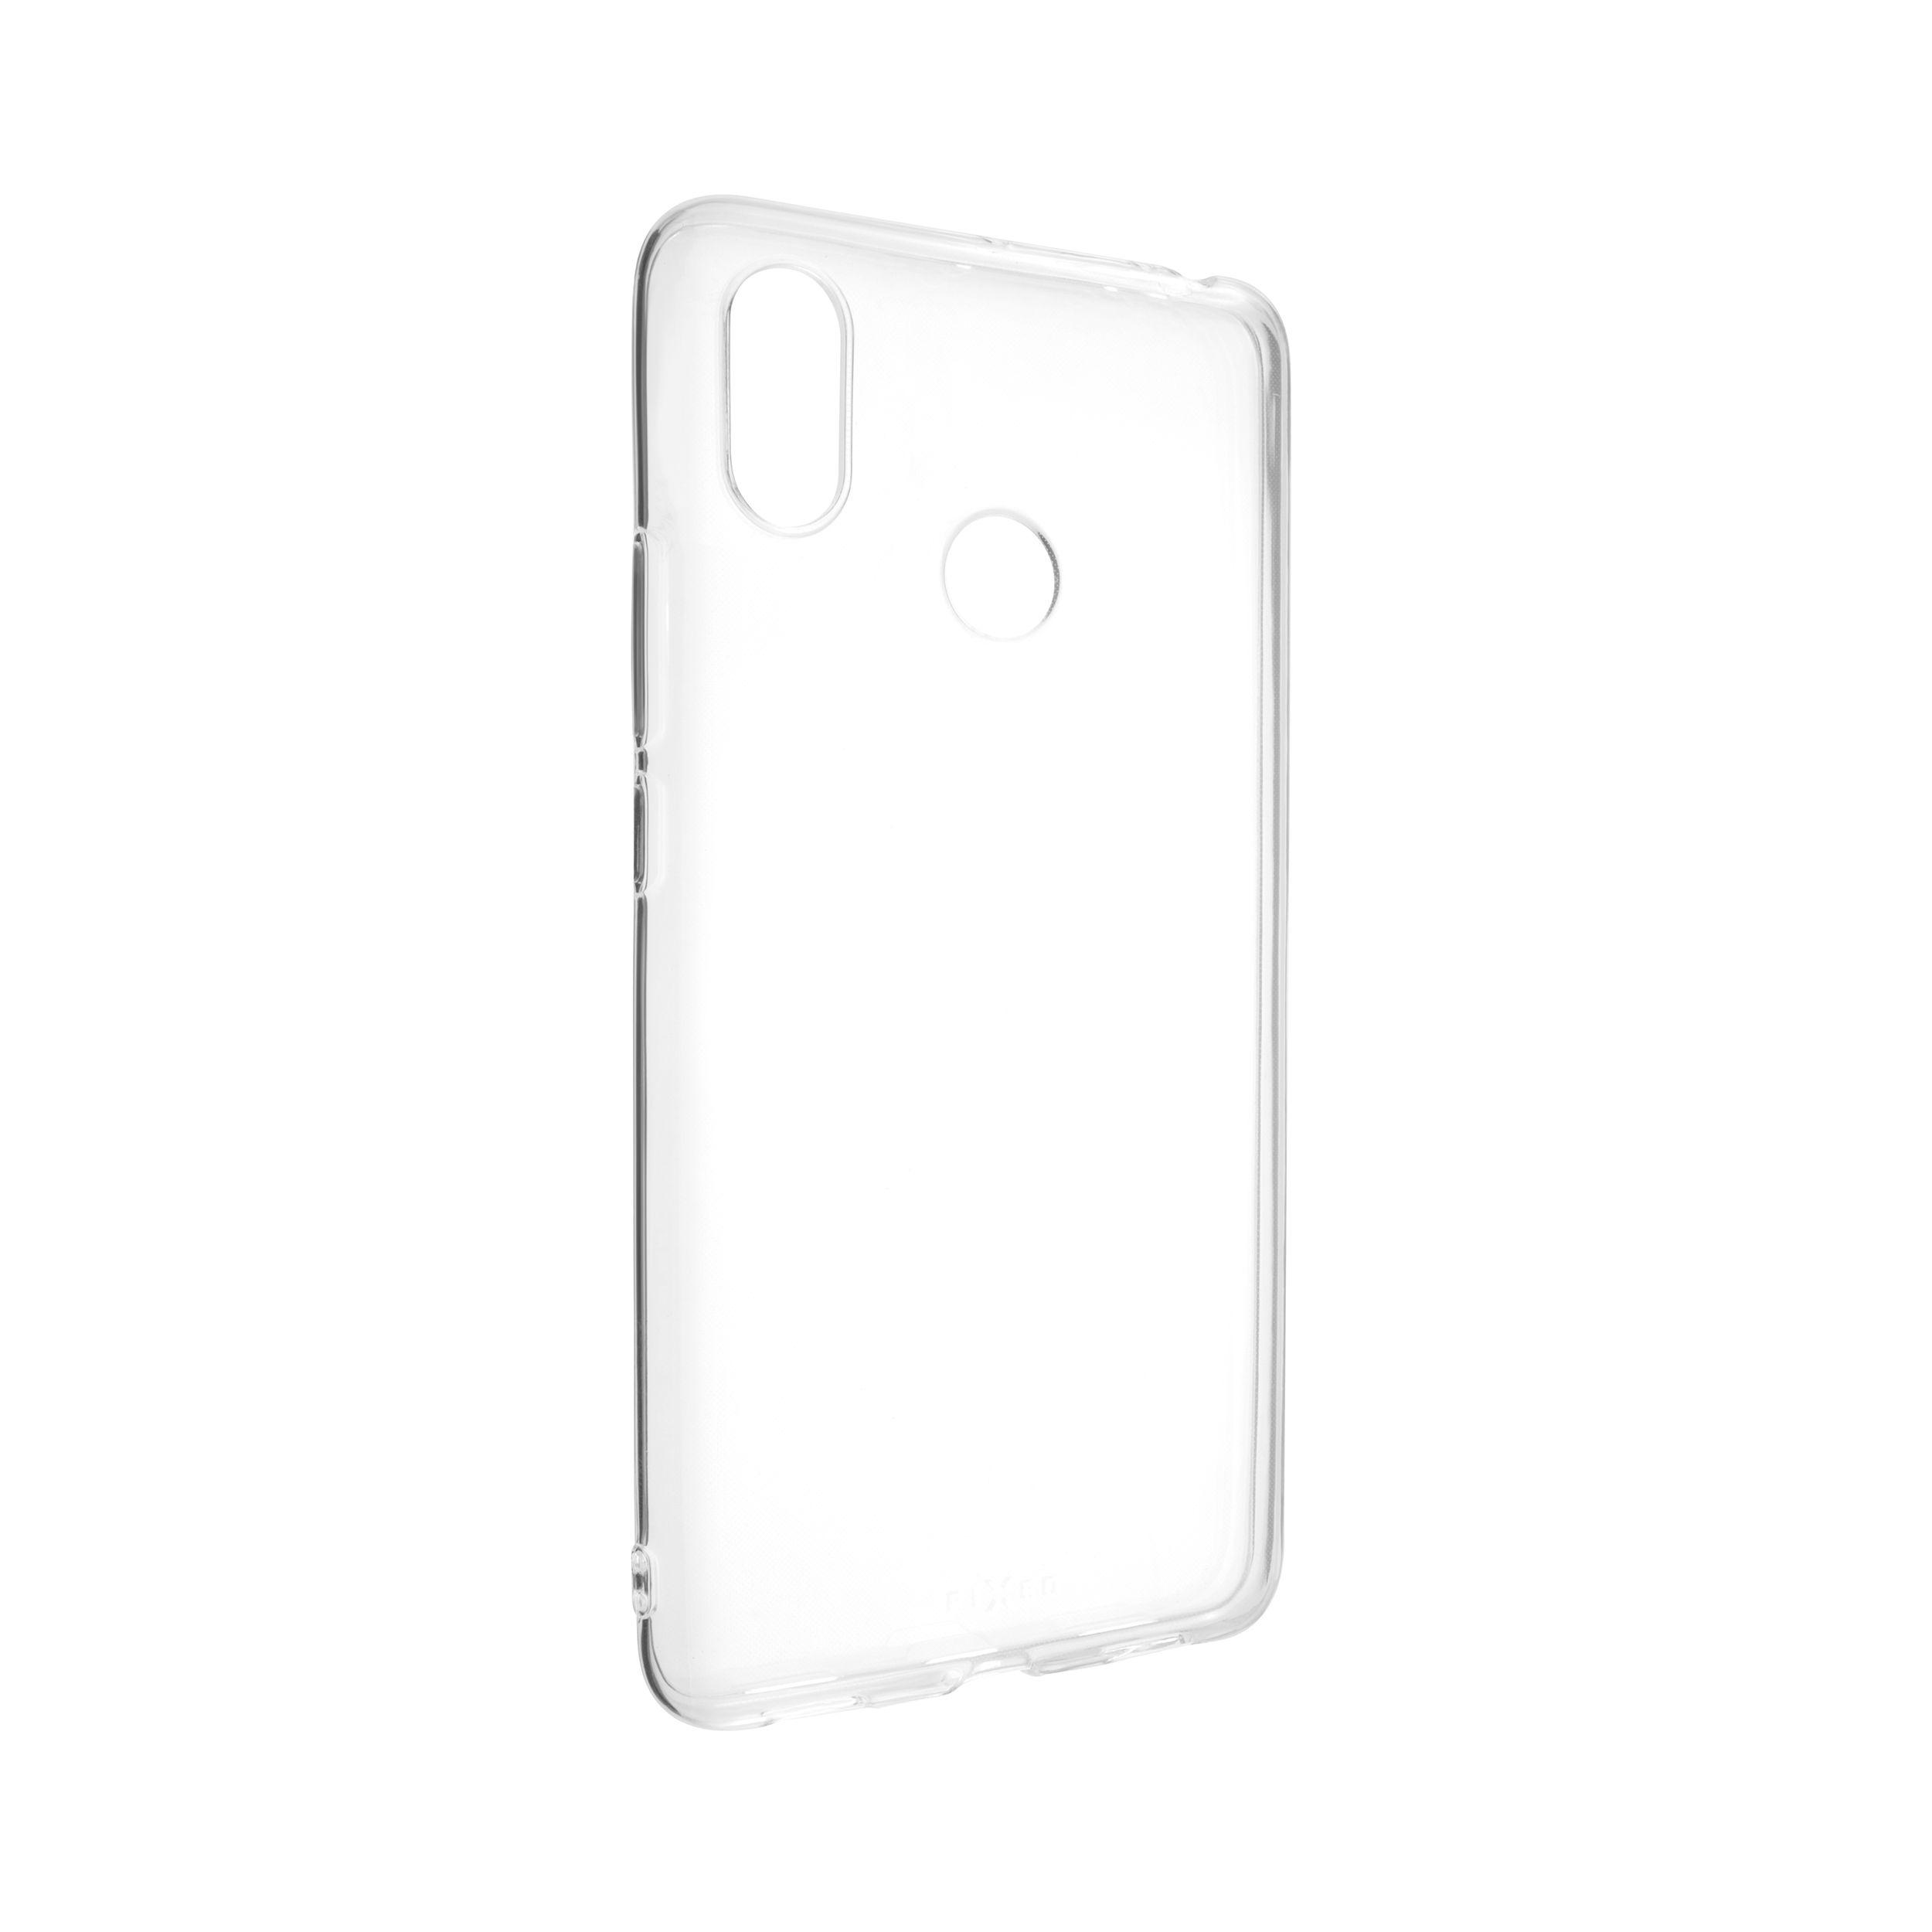 TPU gelové pouzdro FIXED pro Xiaomi Mi Max 3, čiré